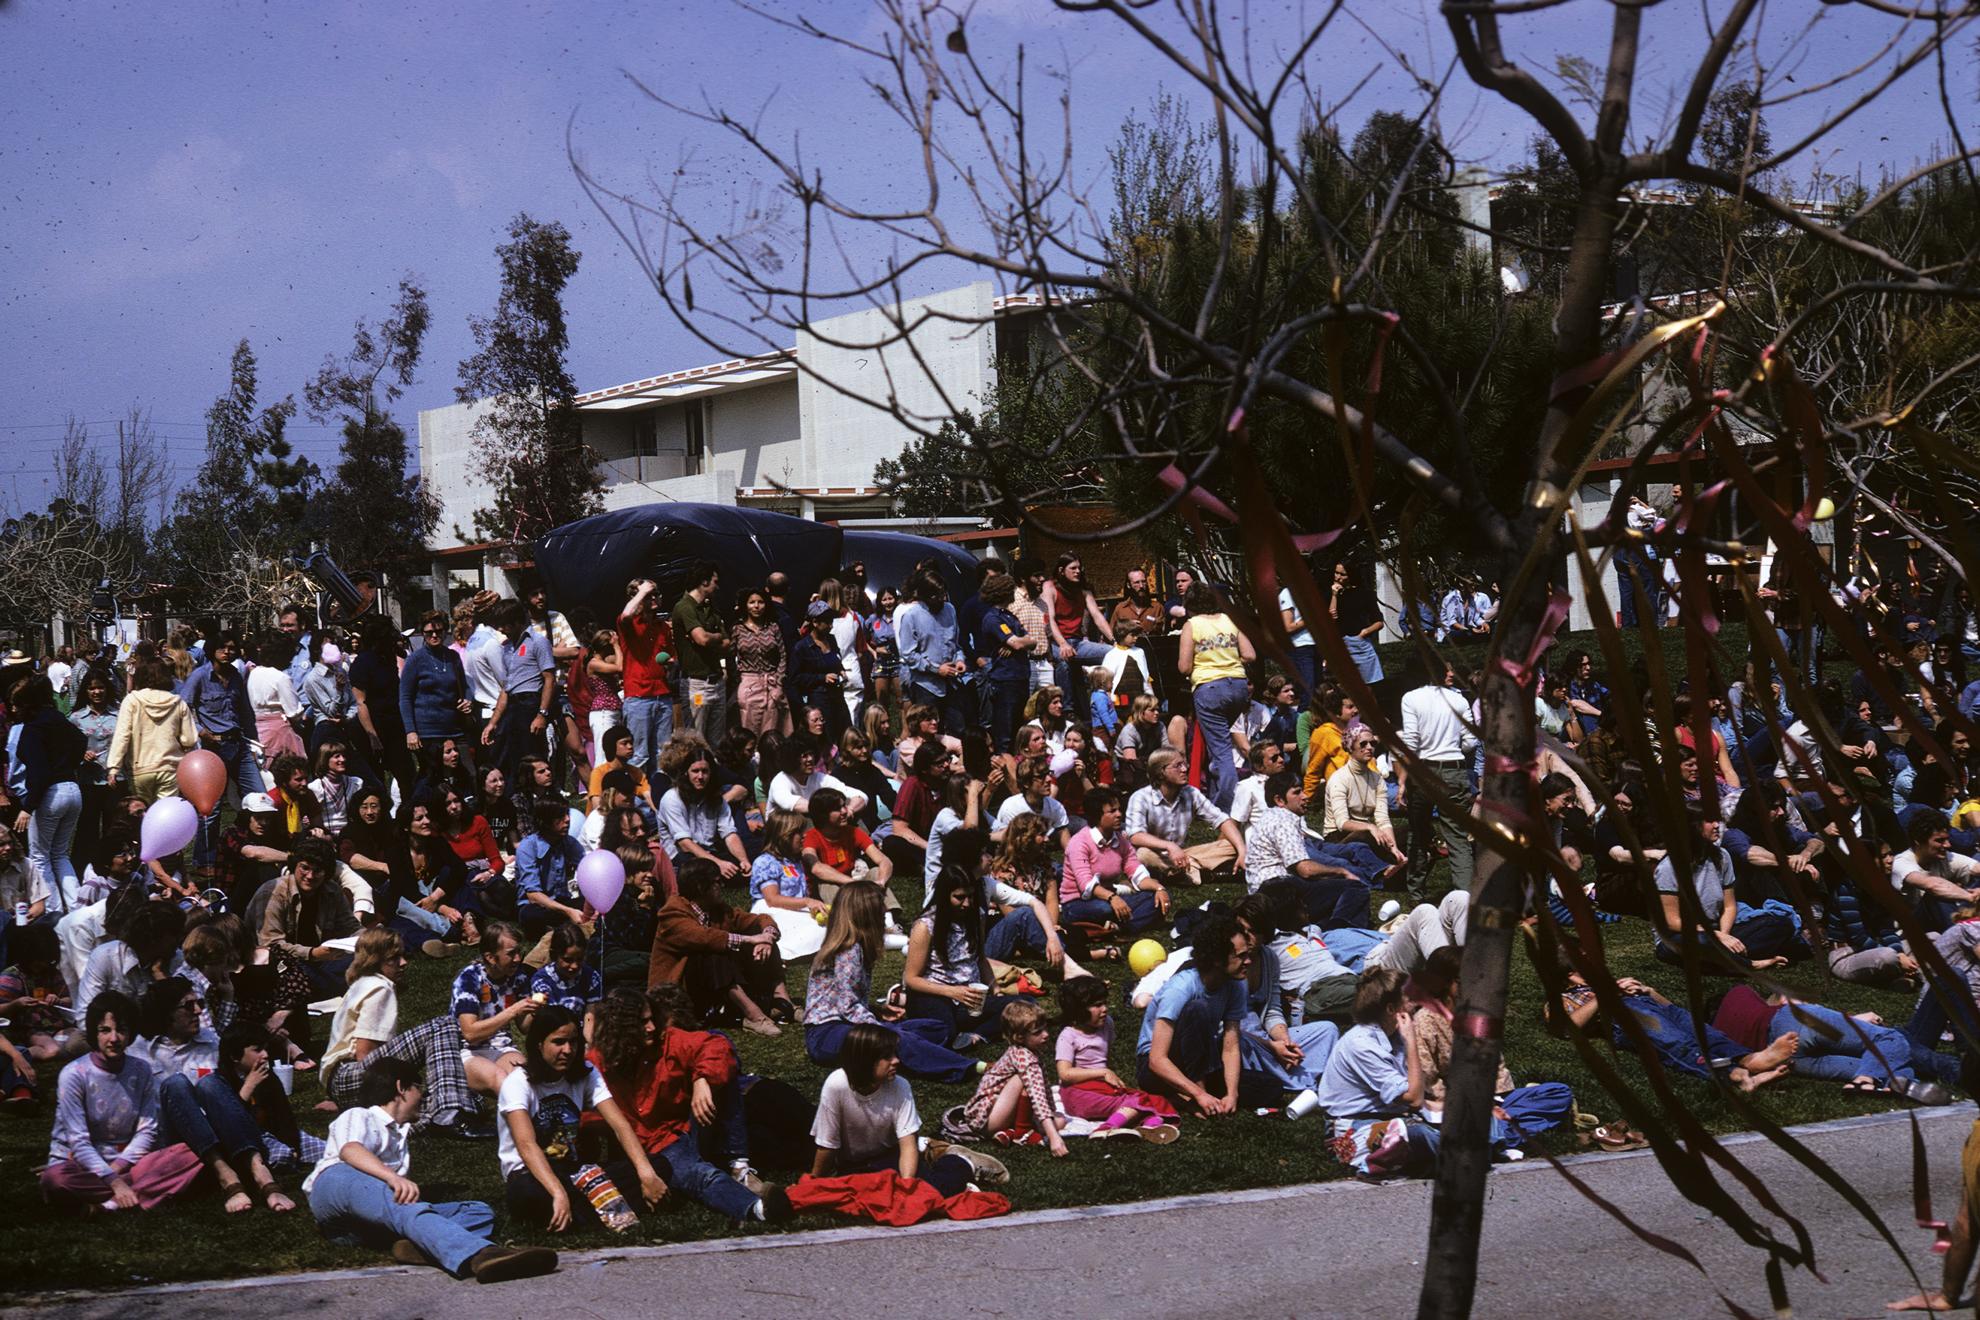 1975 Kohoutek crowd on the Mounds.